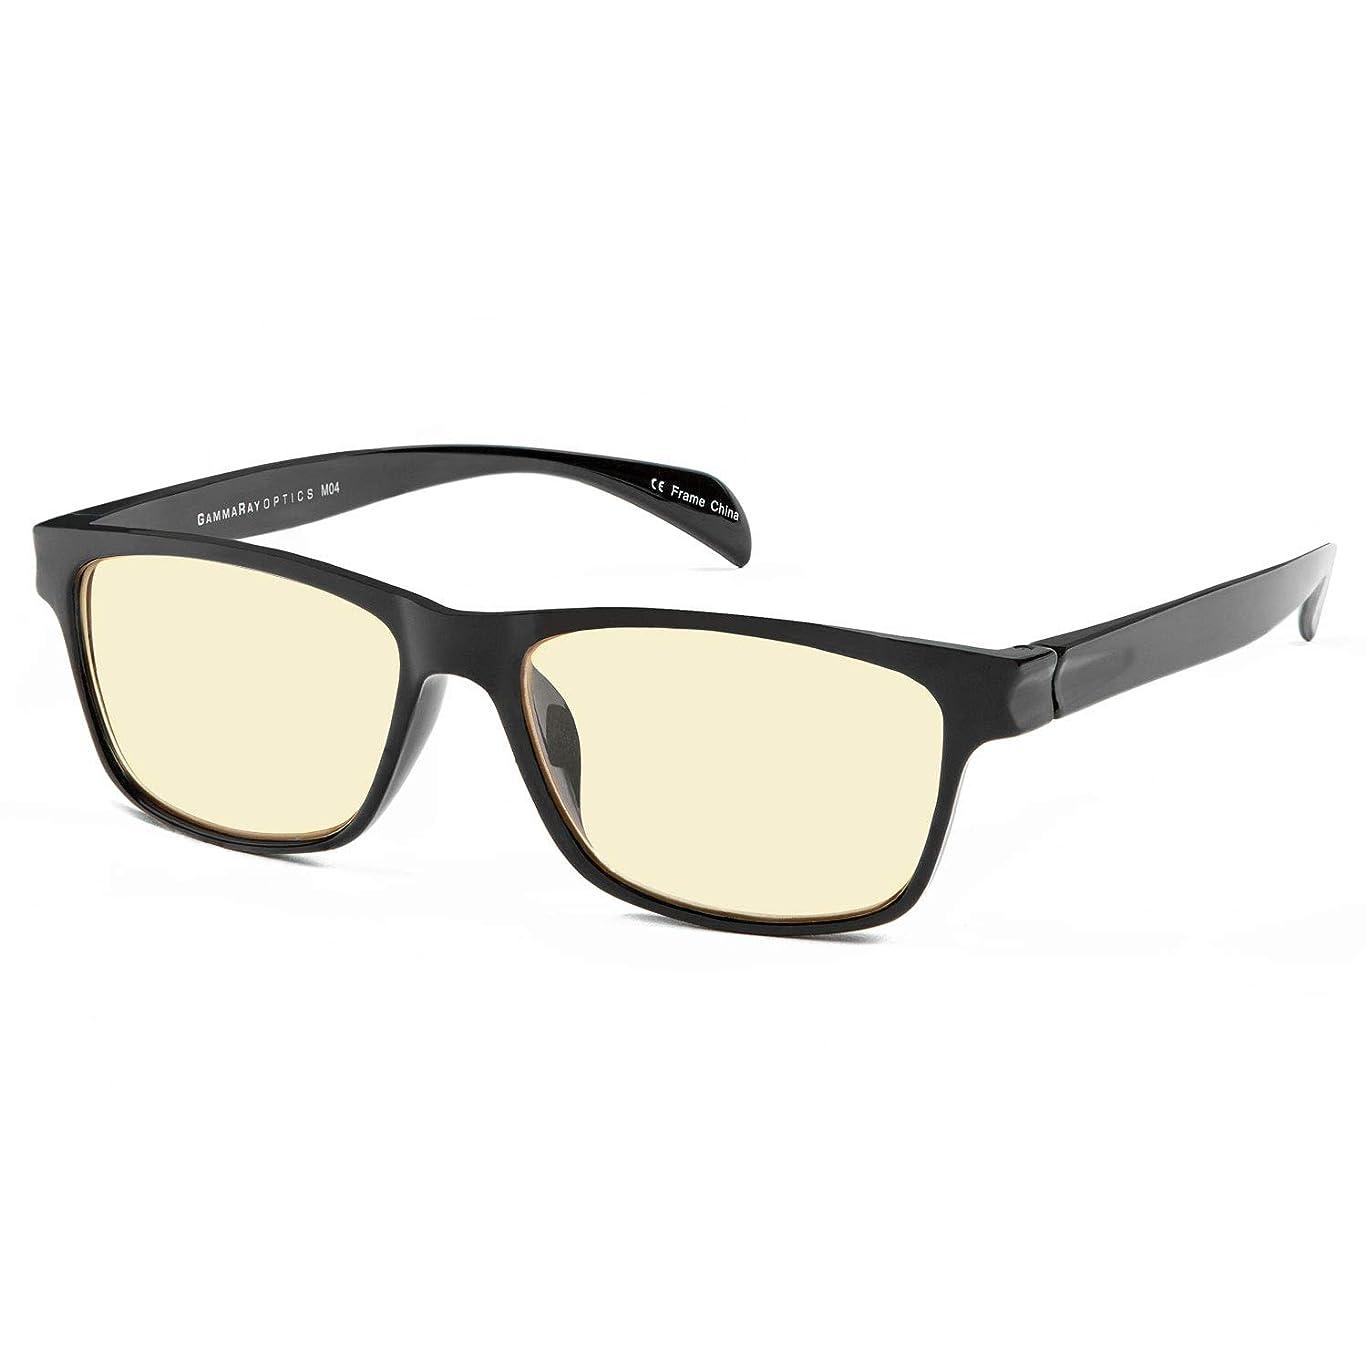 Gamma Ray Blue Light Blocking Glasses Amber Tint Anti Glare UV Digital Eyestrain